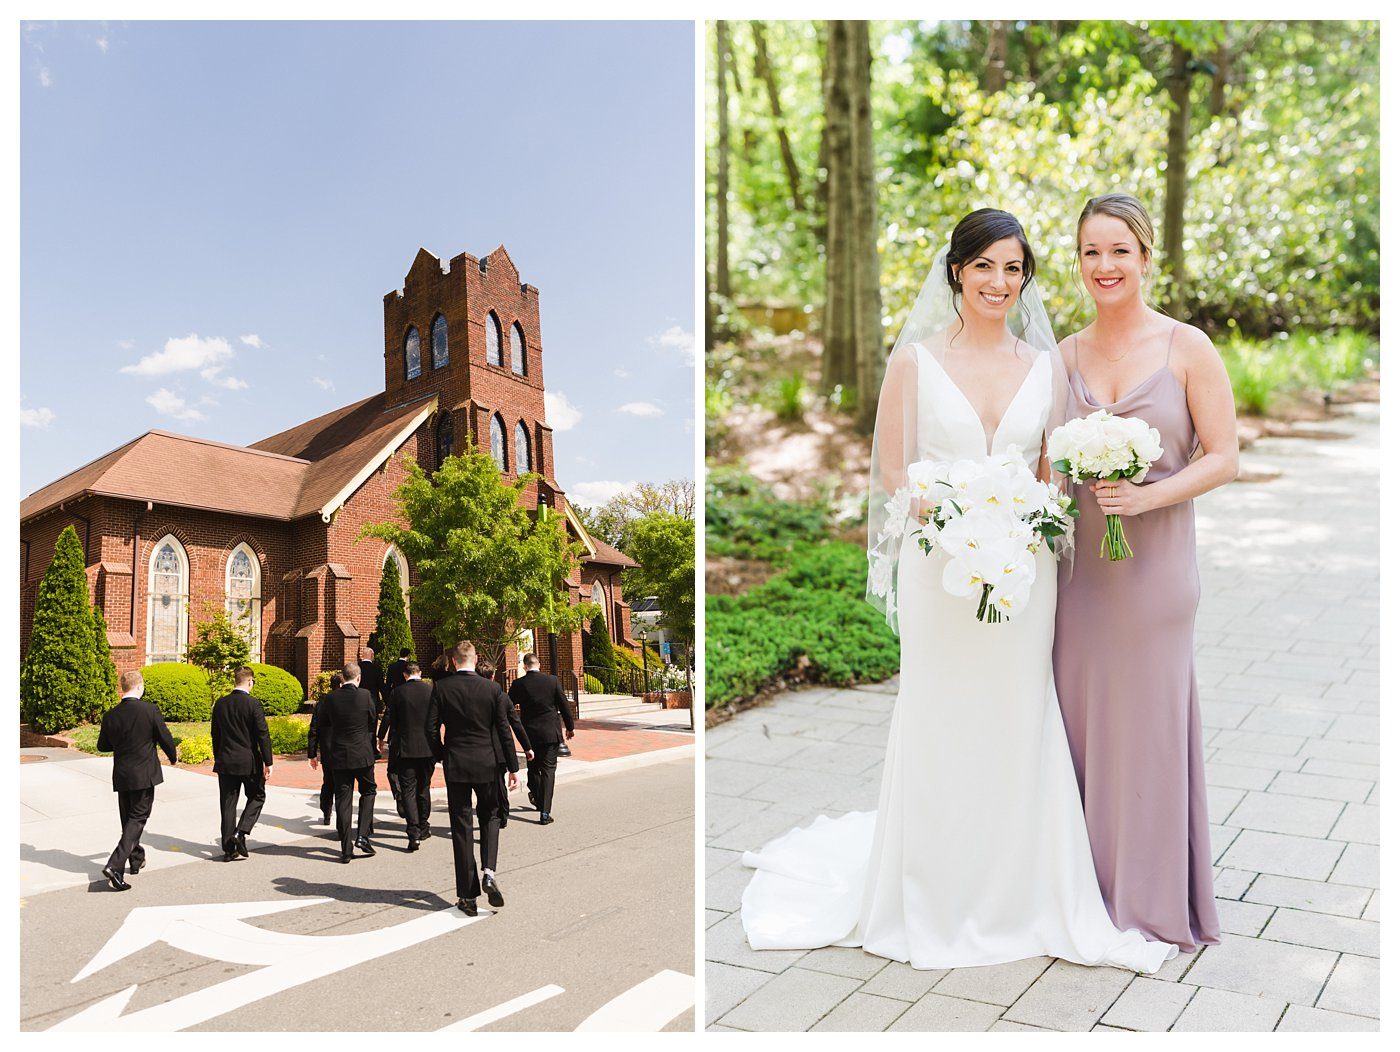 Angus Barn Wedding Photography - Amanda & Grady